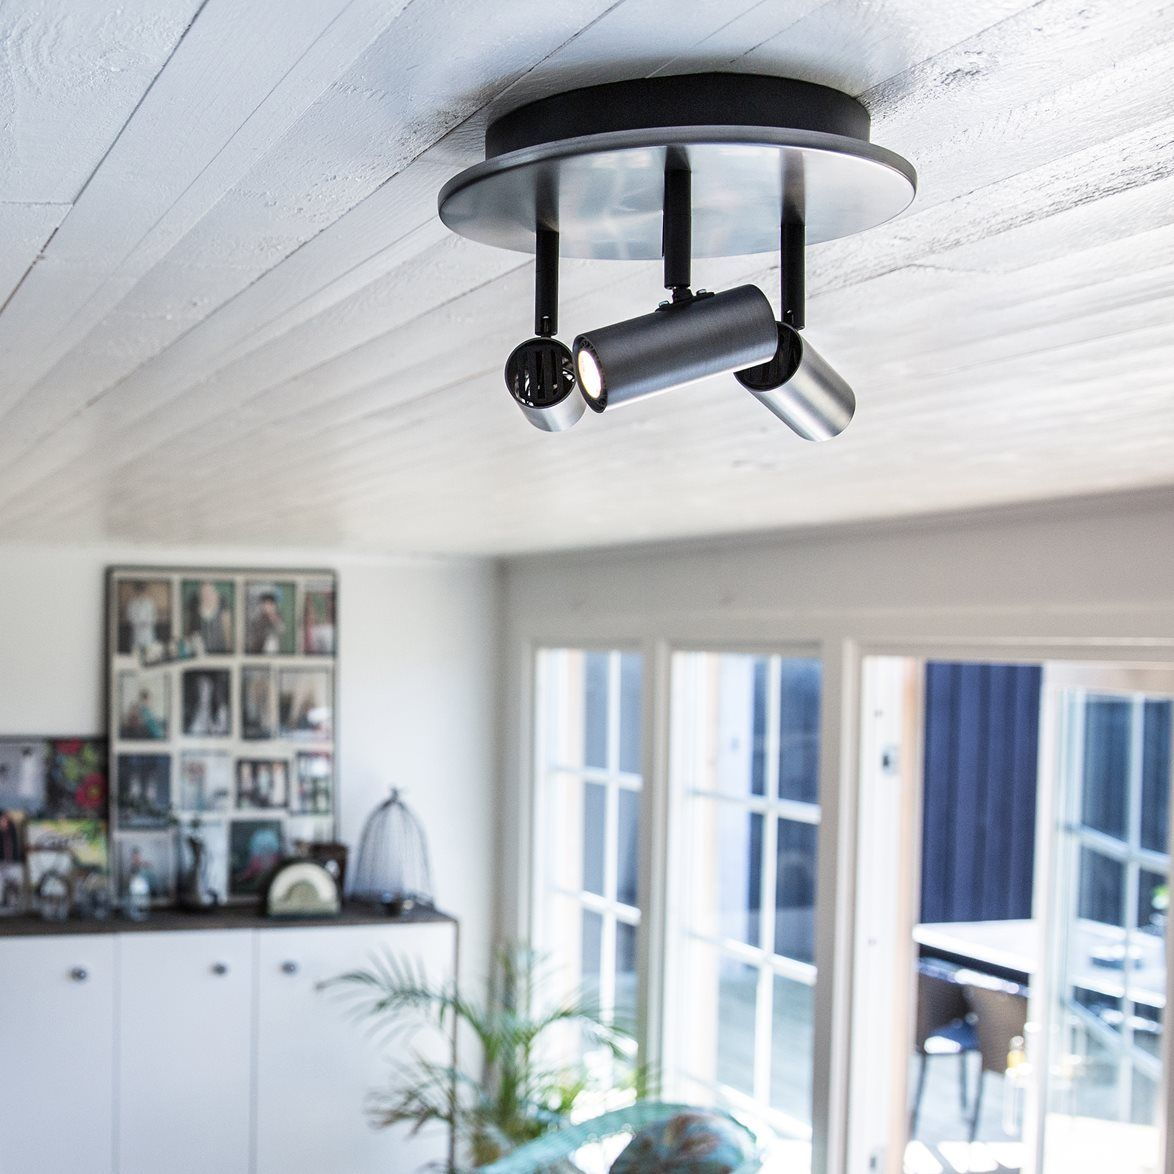 Cato Led Triospot Oxidgrå Brightbelysning Bright123 Belysning Inredning Lampor Belysning Design Lampor